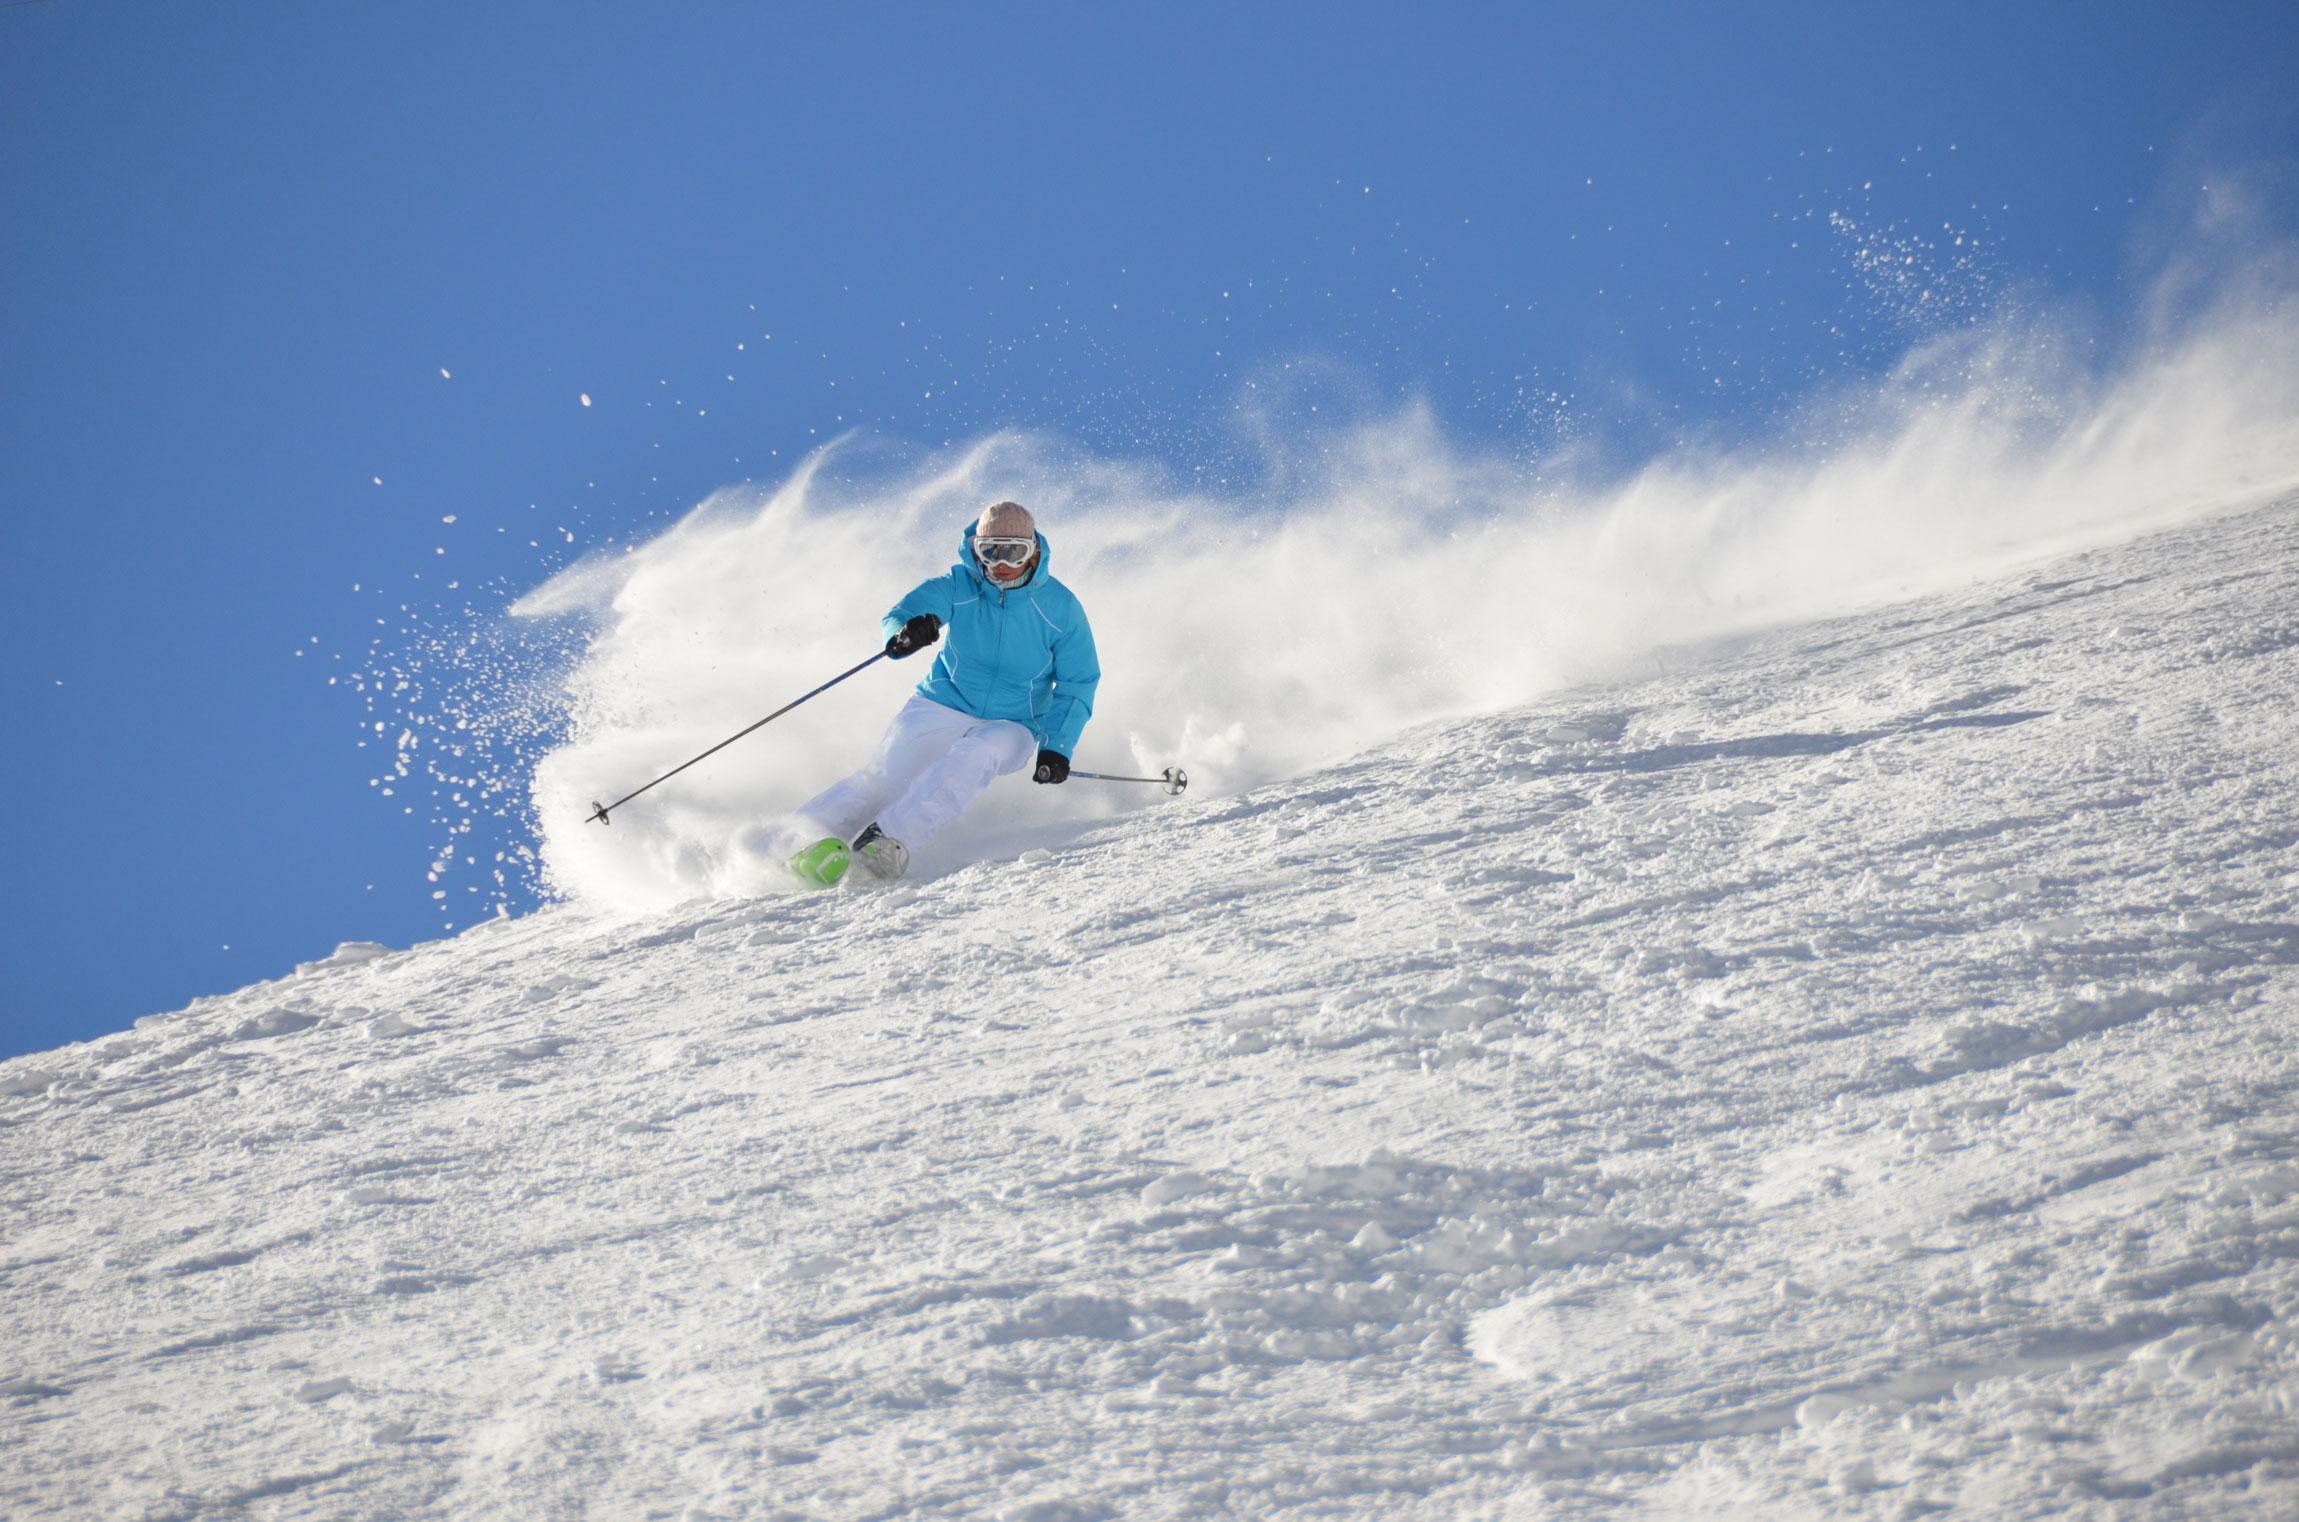 Ski-Valle-Nevado-GS-6.jpg